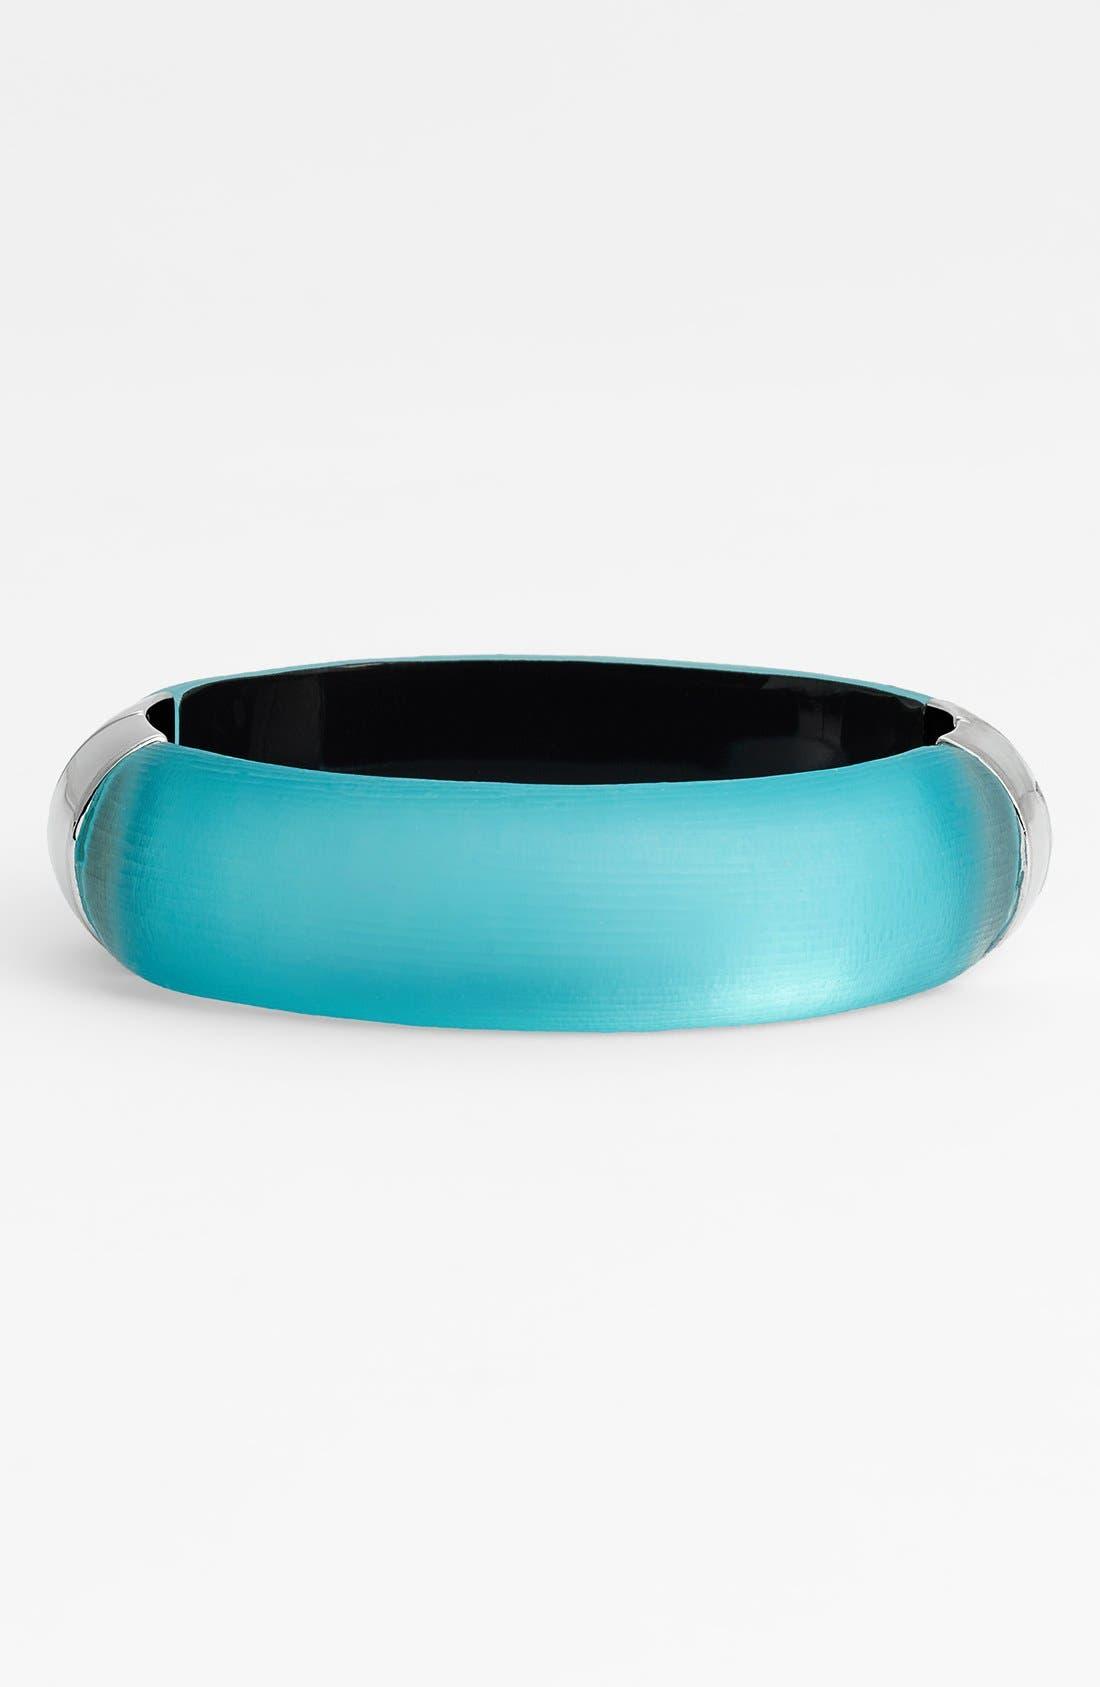 Alternate Image 1 Selected - Alexis Bittar 'Lucite® - Neon Deco' Bangle Bracelet